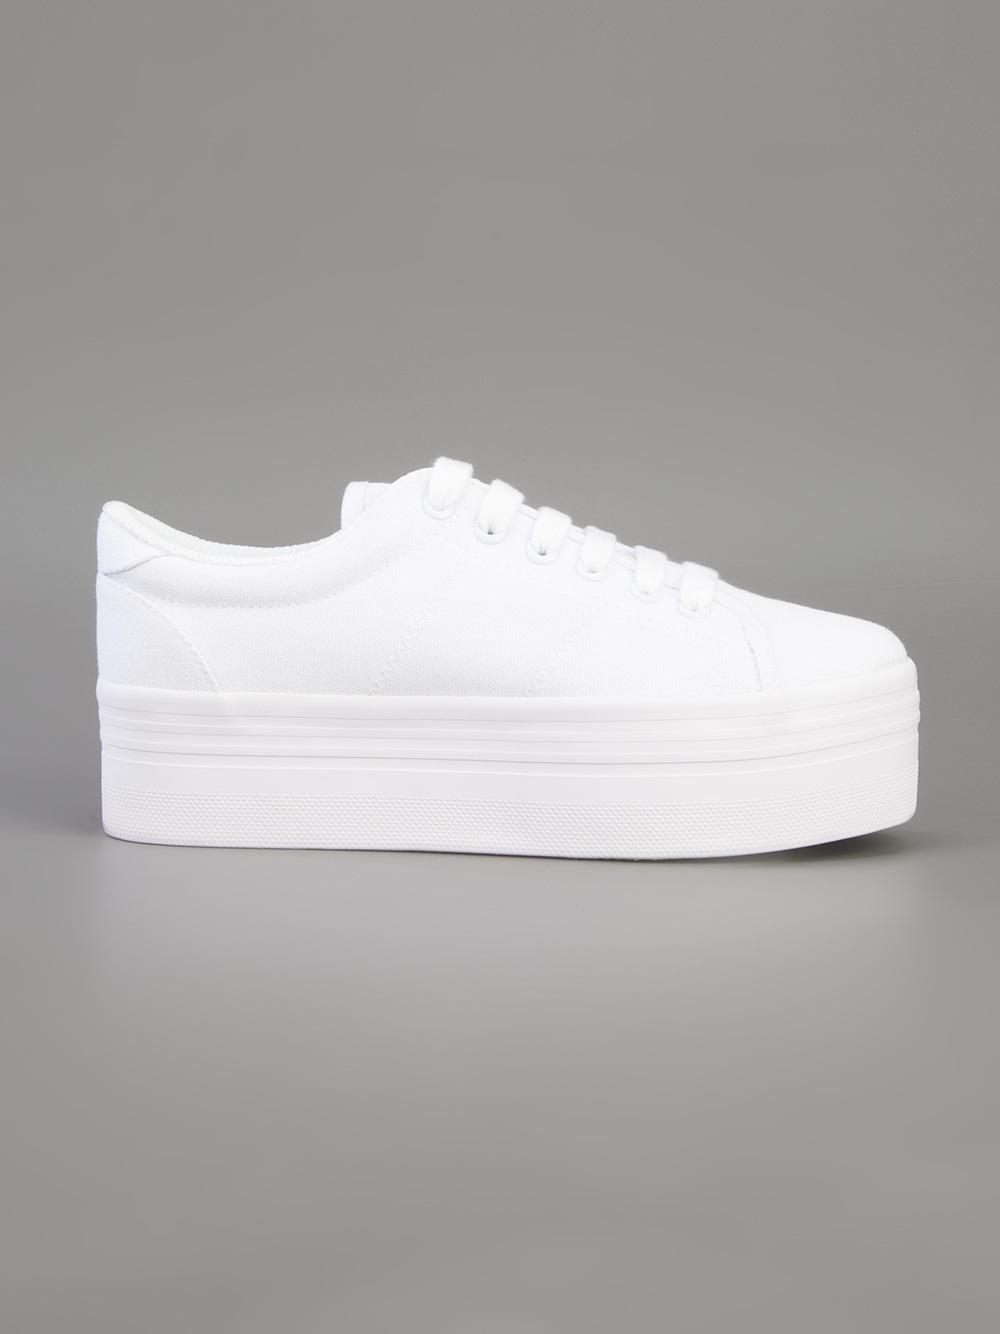 997f198c79d Jeffrey Campbell Homg Platform Sneaker in White - Lyst